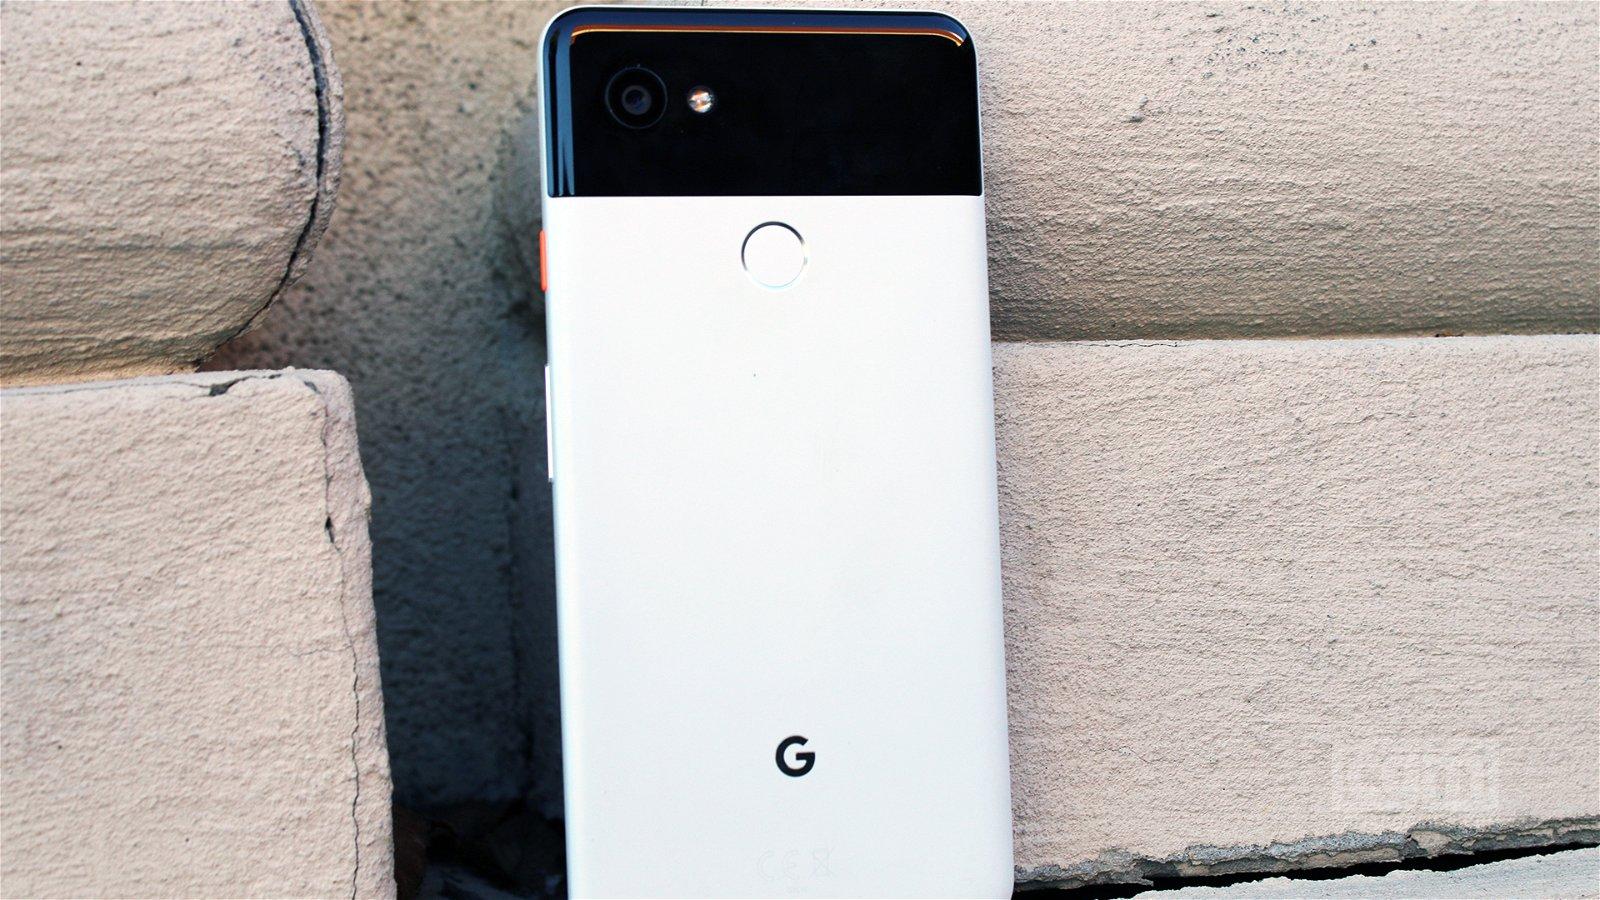 Google Pixel 2 XL Review: A Controversial Flagship